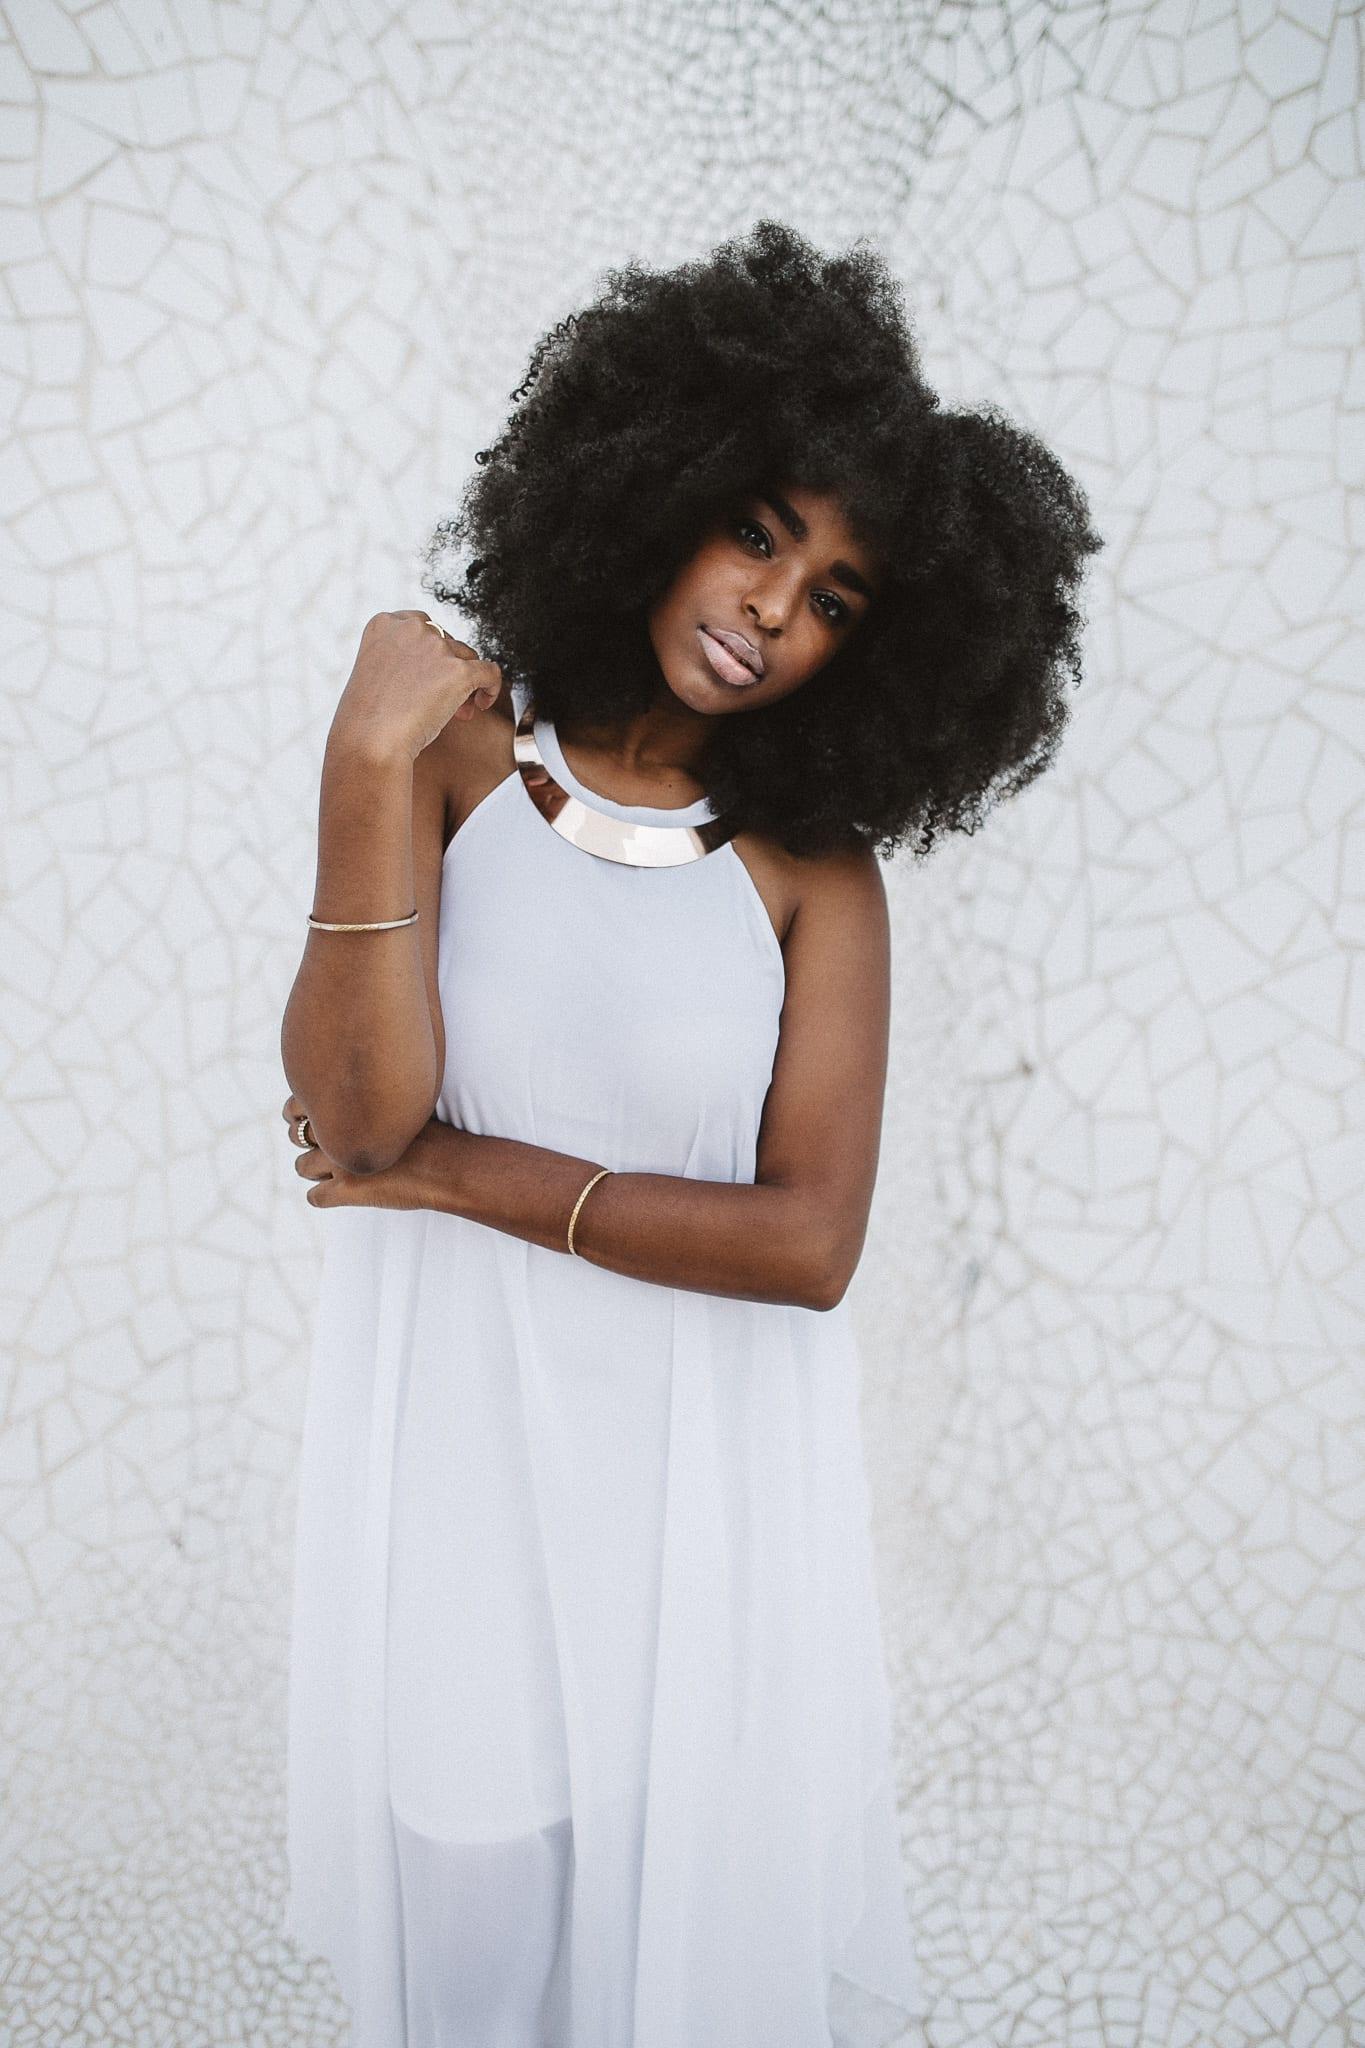 sundial-bridge-california-portrait-photographer-black-afro-queen-birthday-8